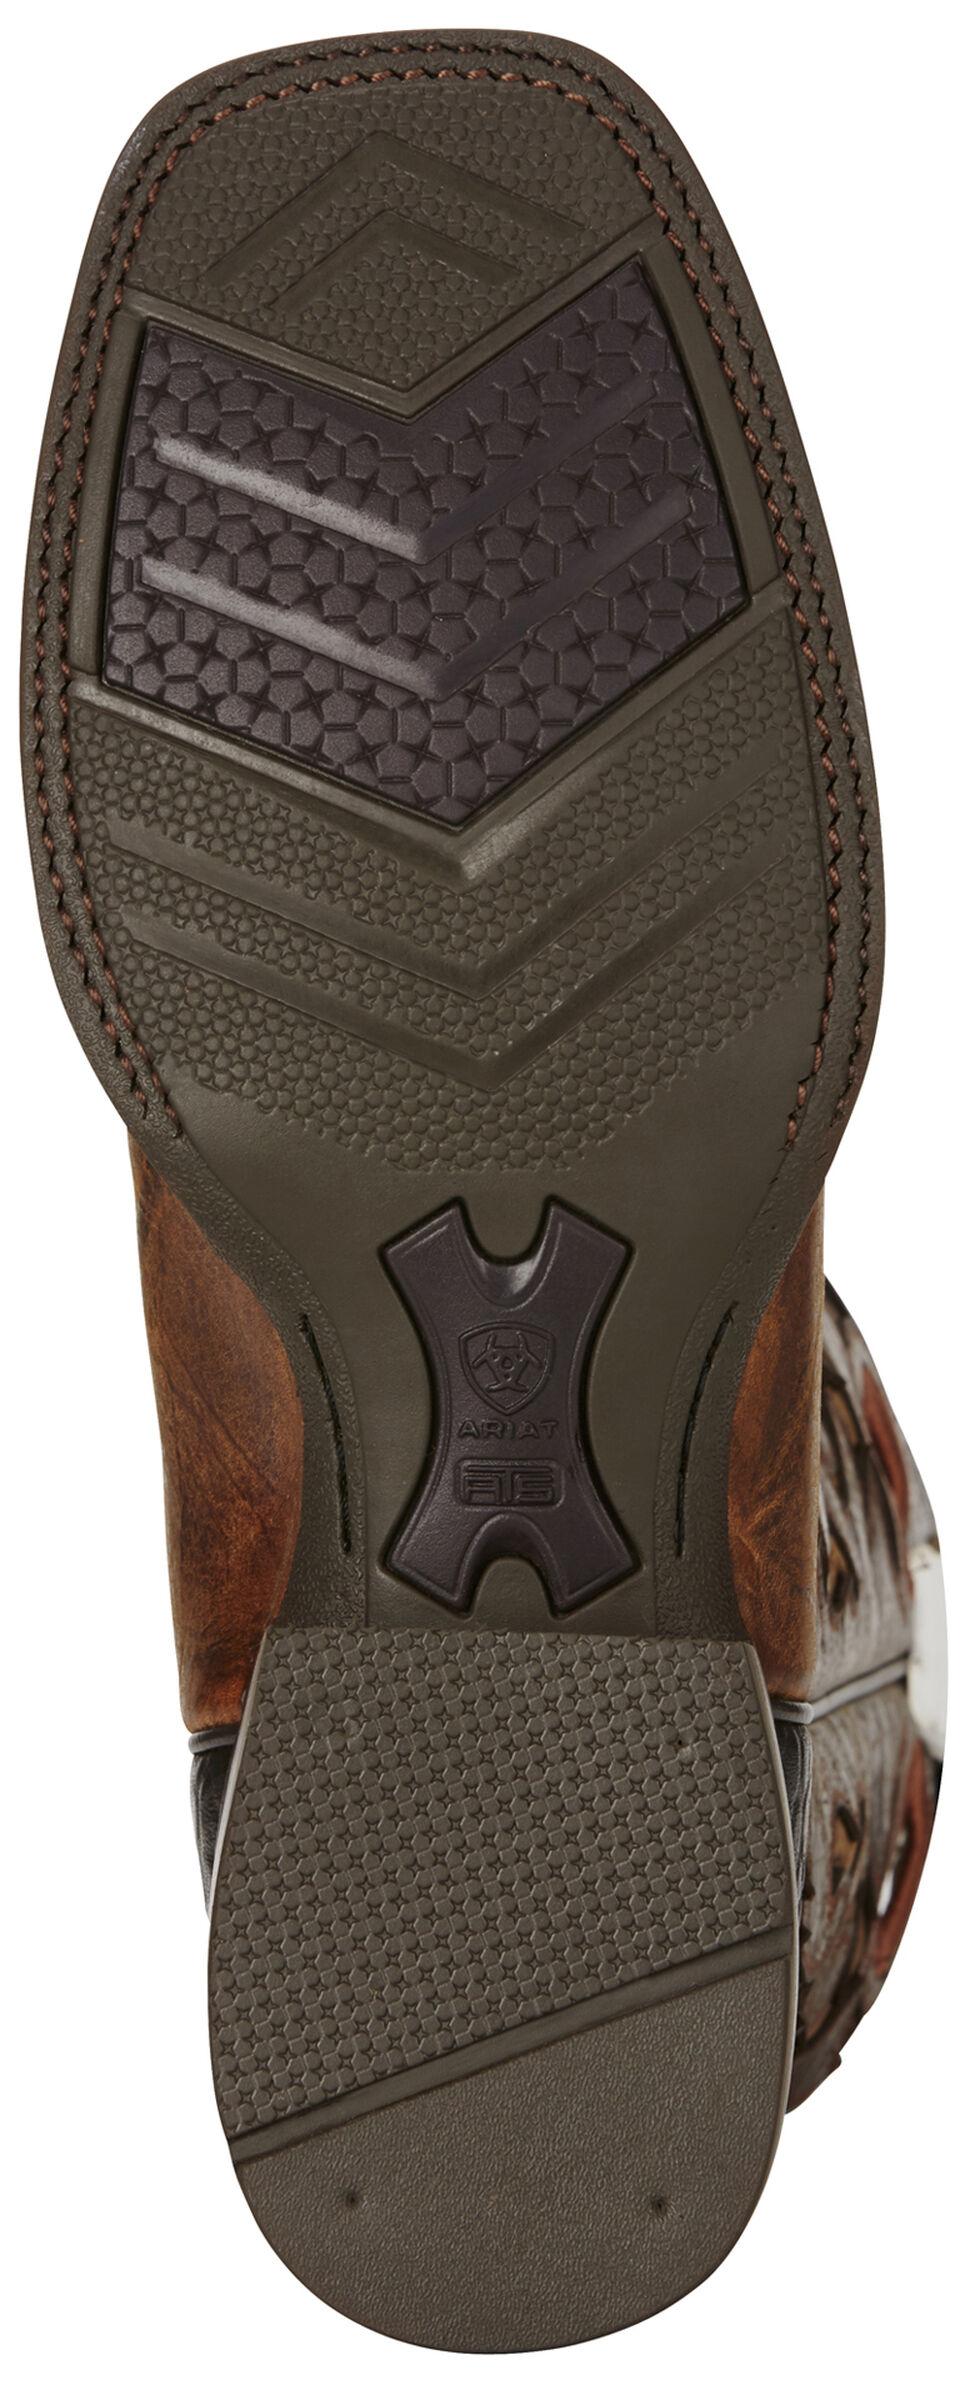 Ariat Copper Barstow Cowboy Boots - Square Toe, Copper, hi-res